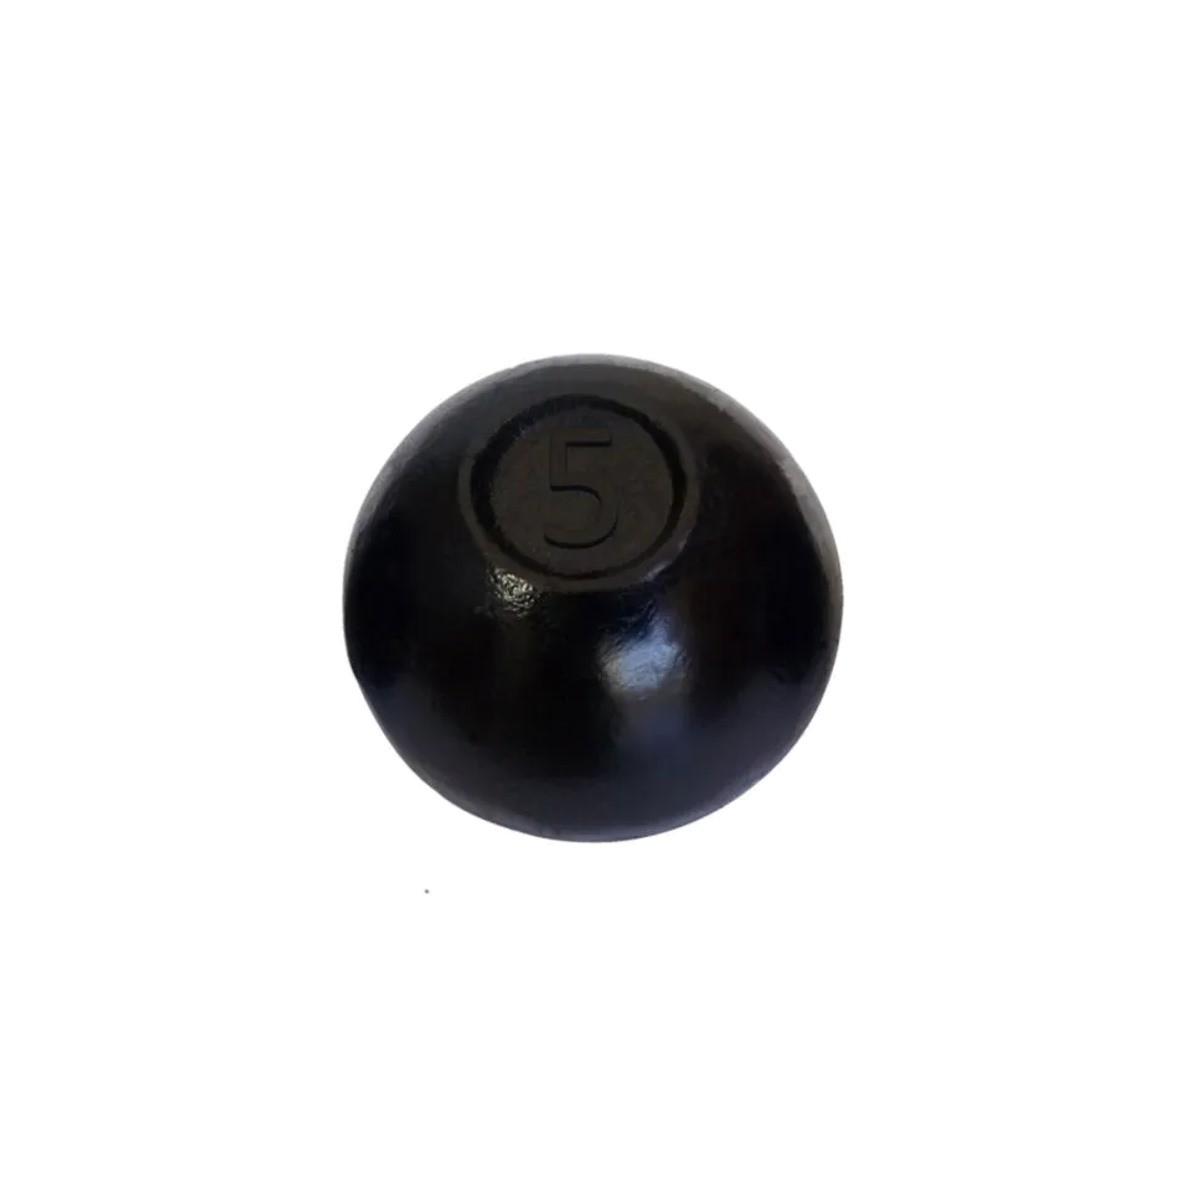 Bola de Arremesso Ferro Fundido Treinamento Funcional 5Kg